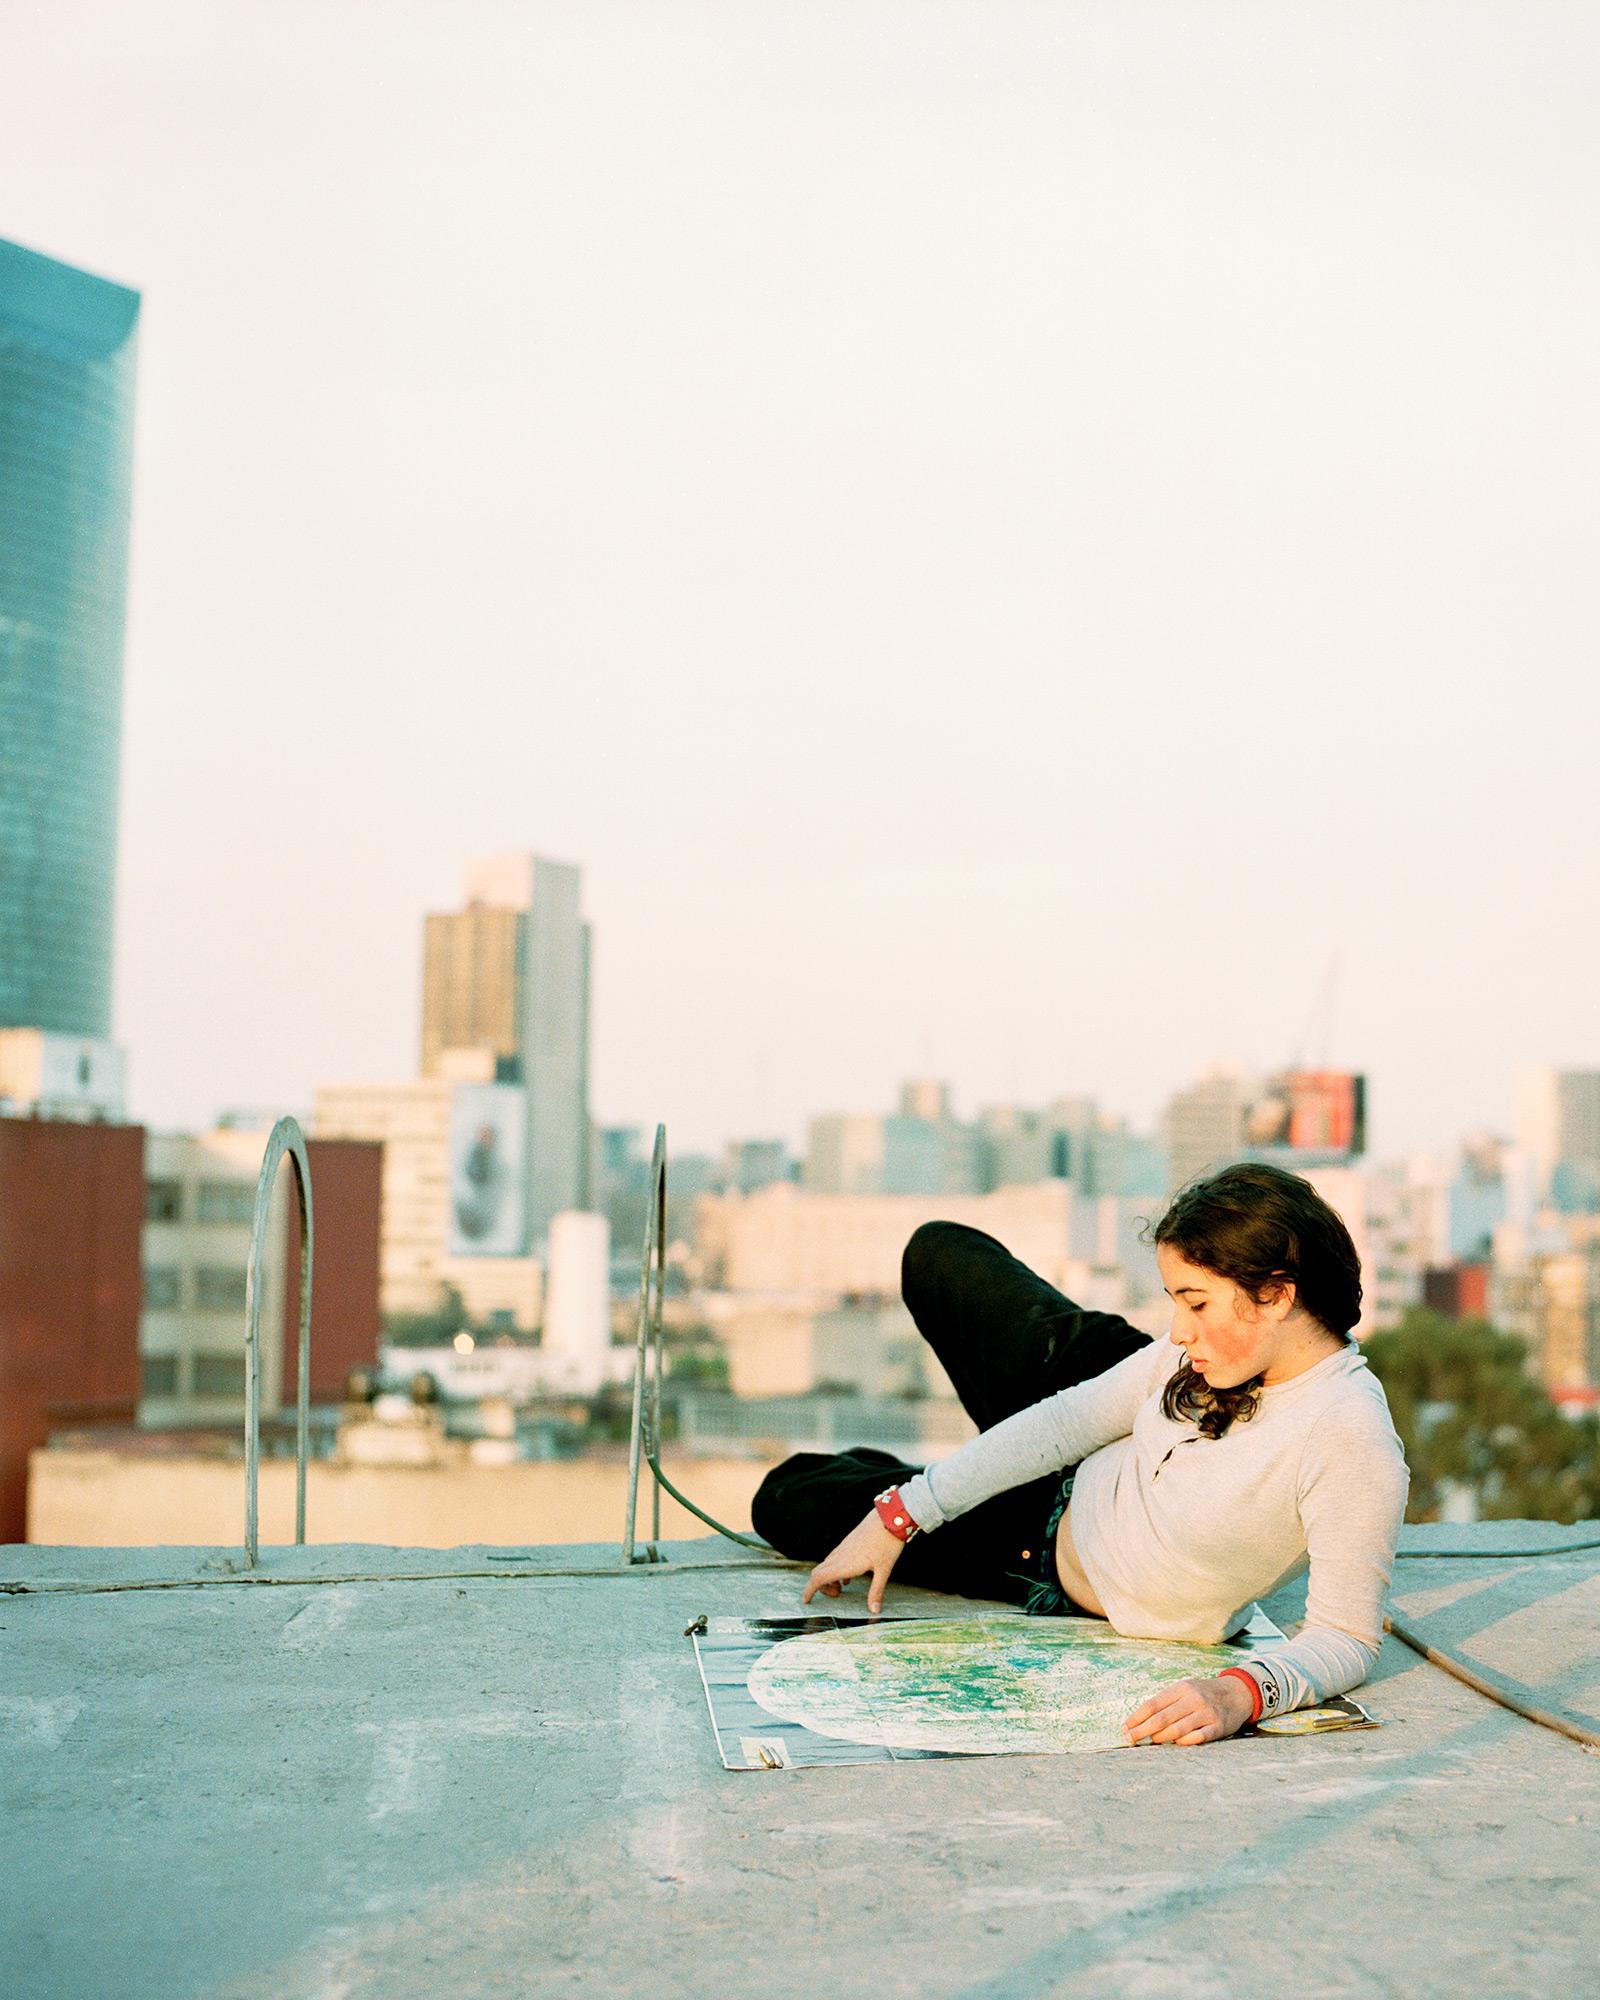 Camila, 15 år, Mexico City.